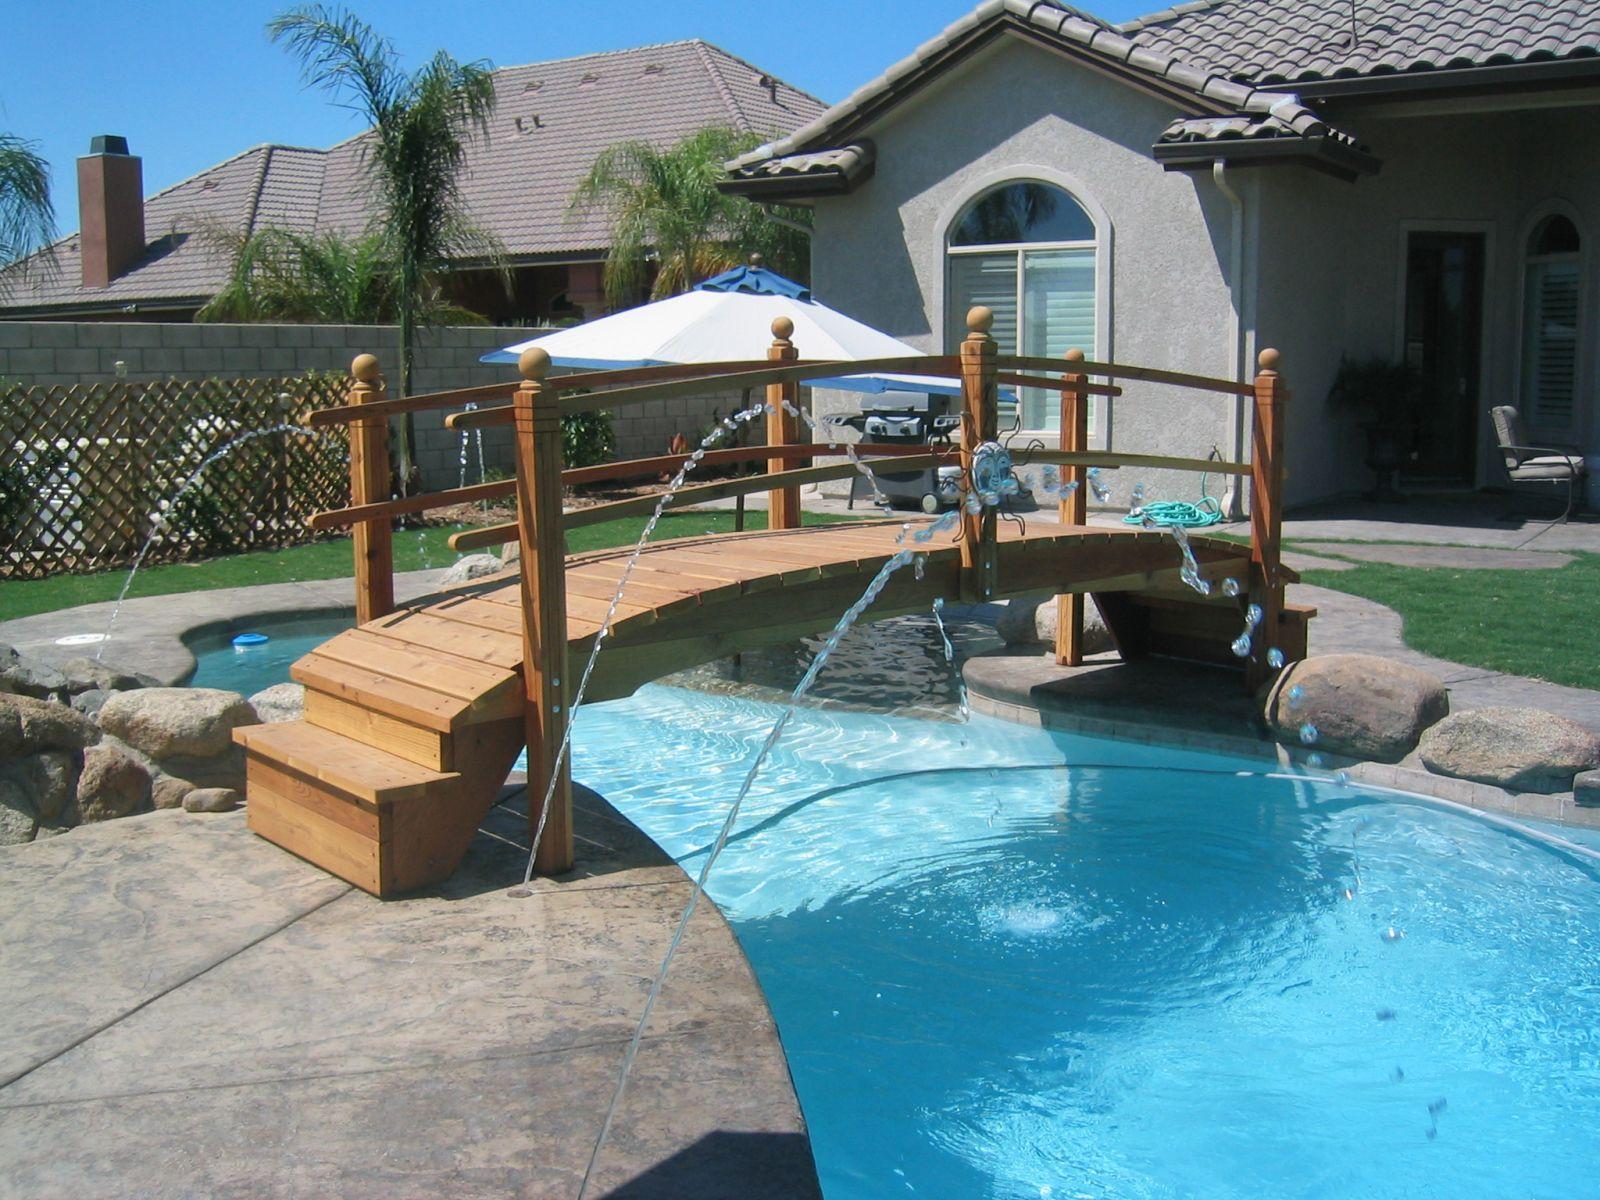 Pool Bridges or Step Bridges